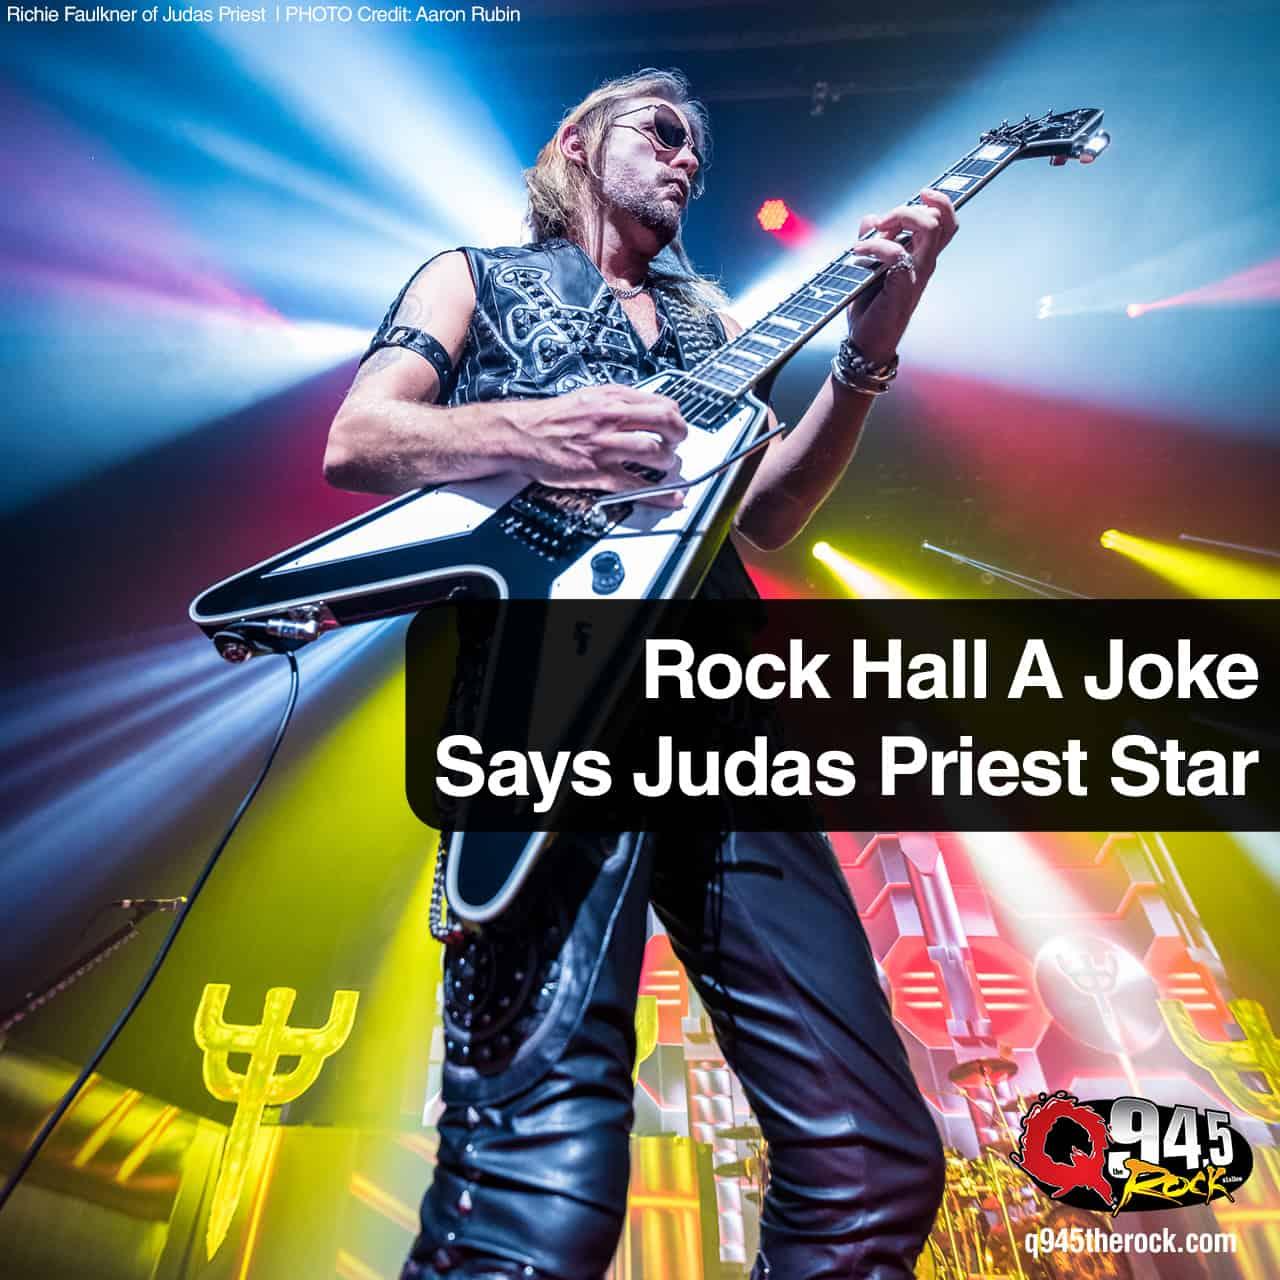 Rock Hall A Joke Says Judas Priest Star